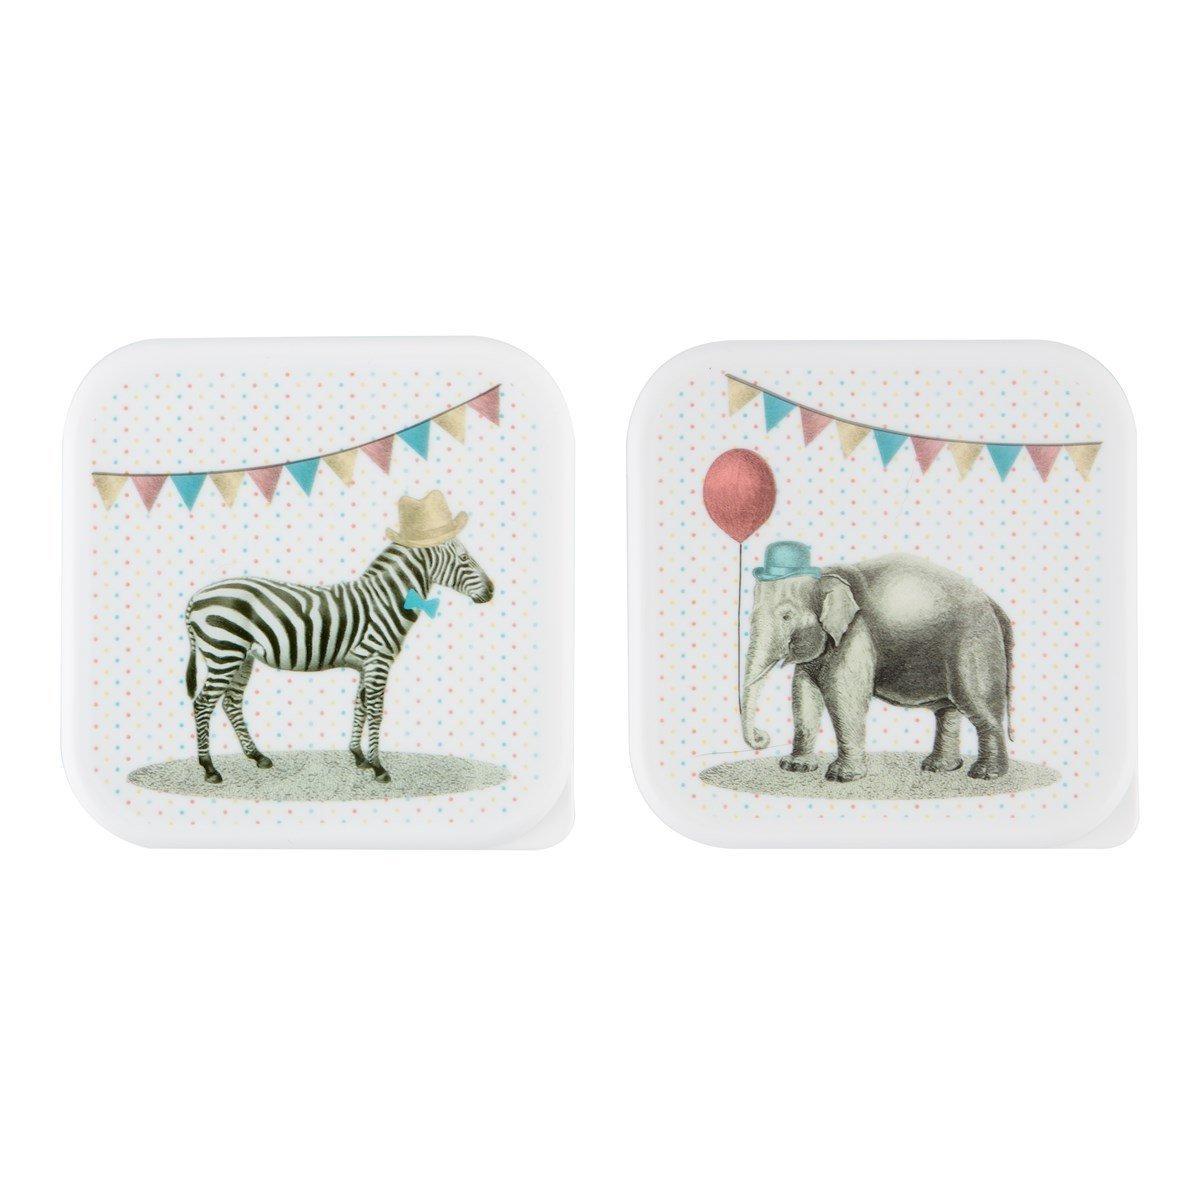 sass & belle Brotdose SET grün rot Party Animals Elefant Zebra Dose Frühstück Brotbox